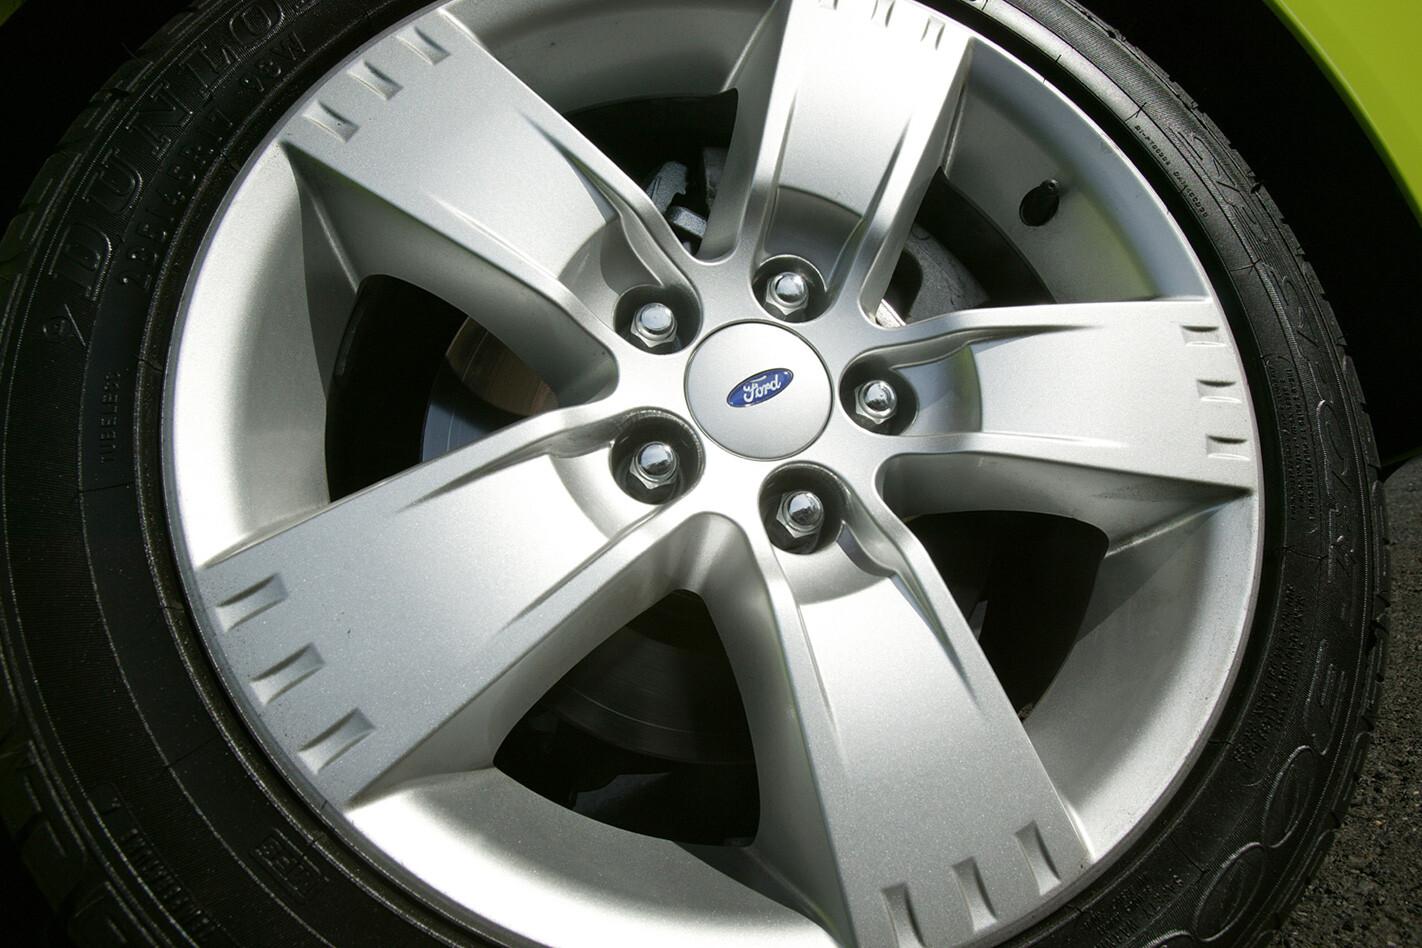 BF-Ford-XR6-Turbo-Auto-wheel.jpg